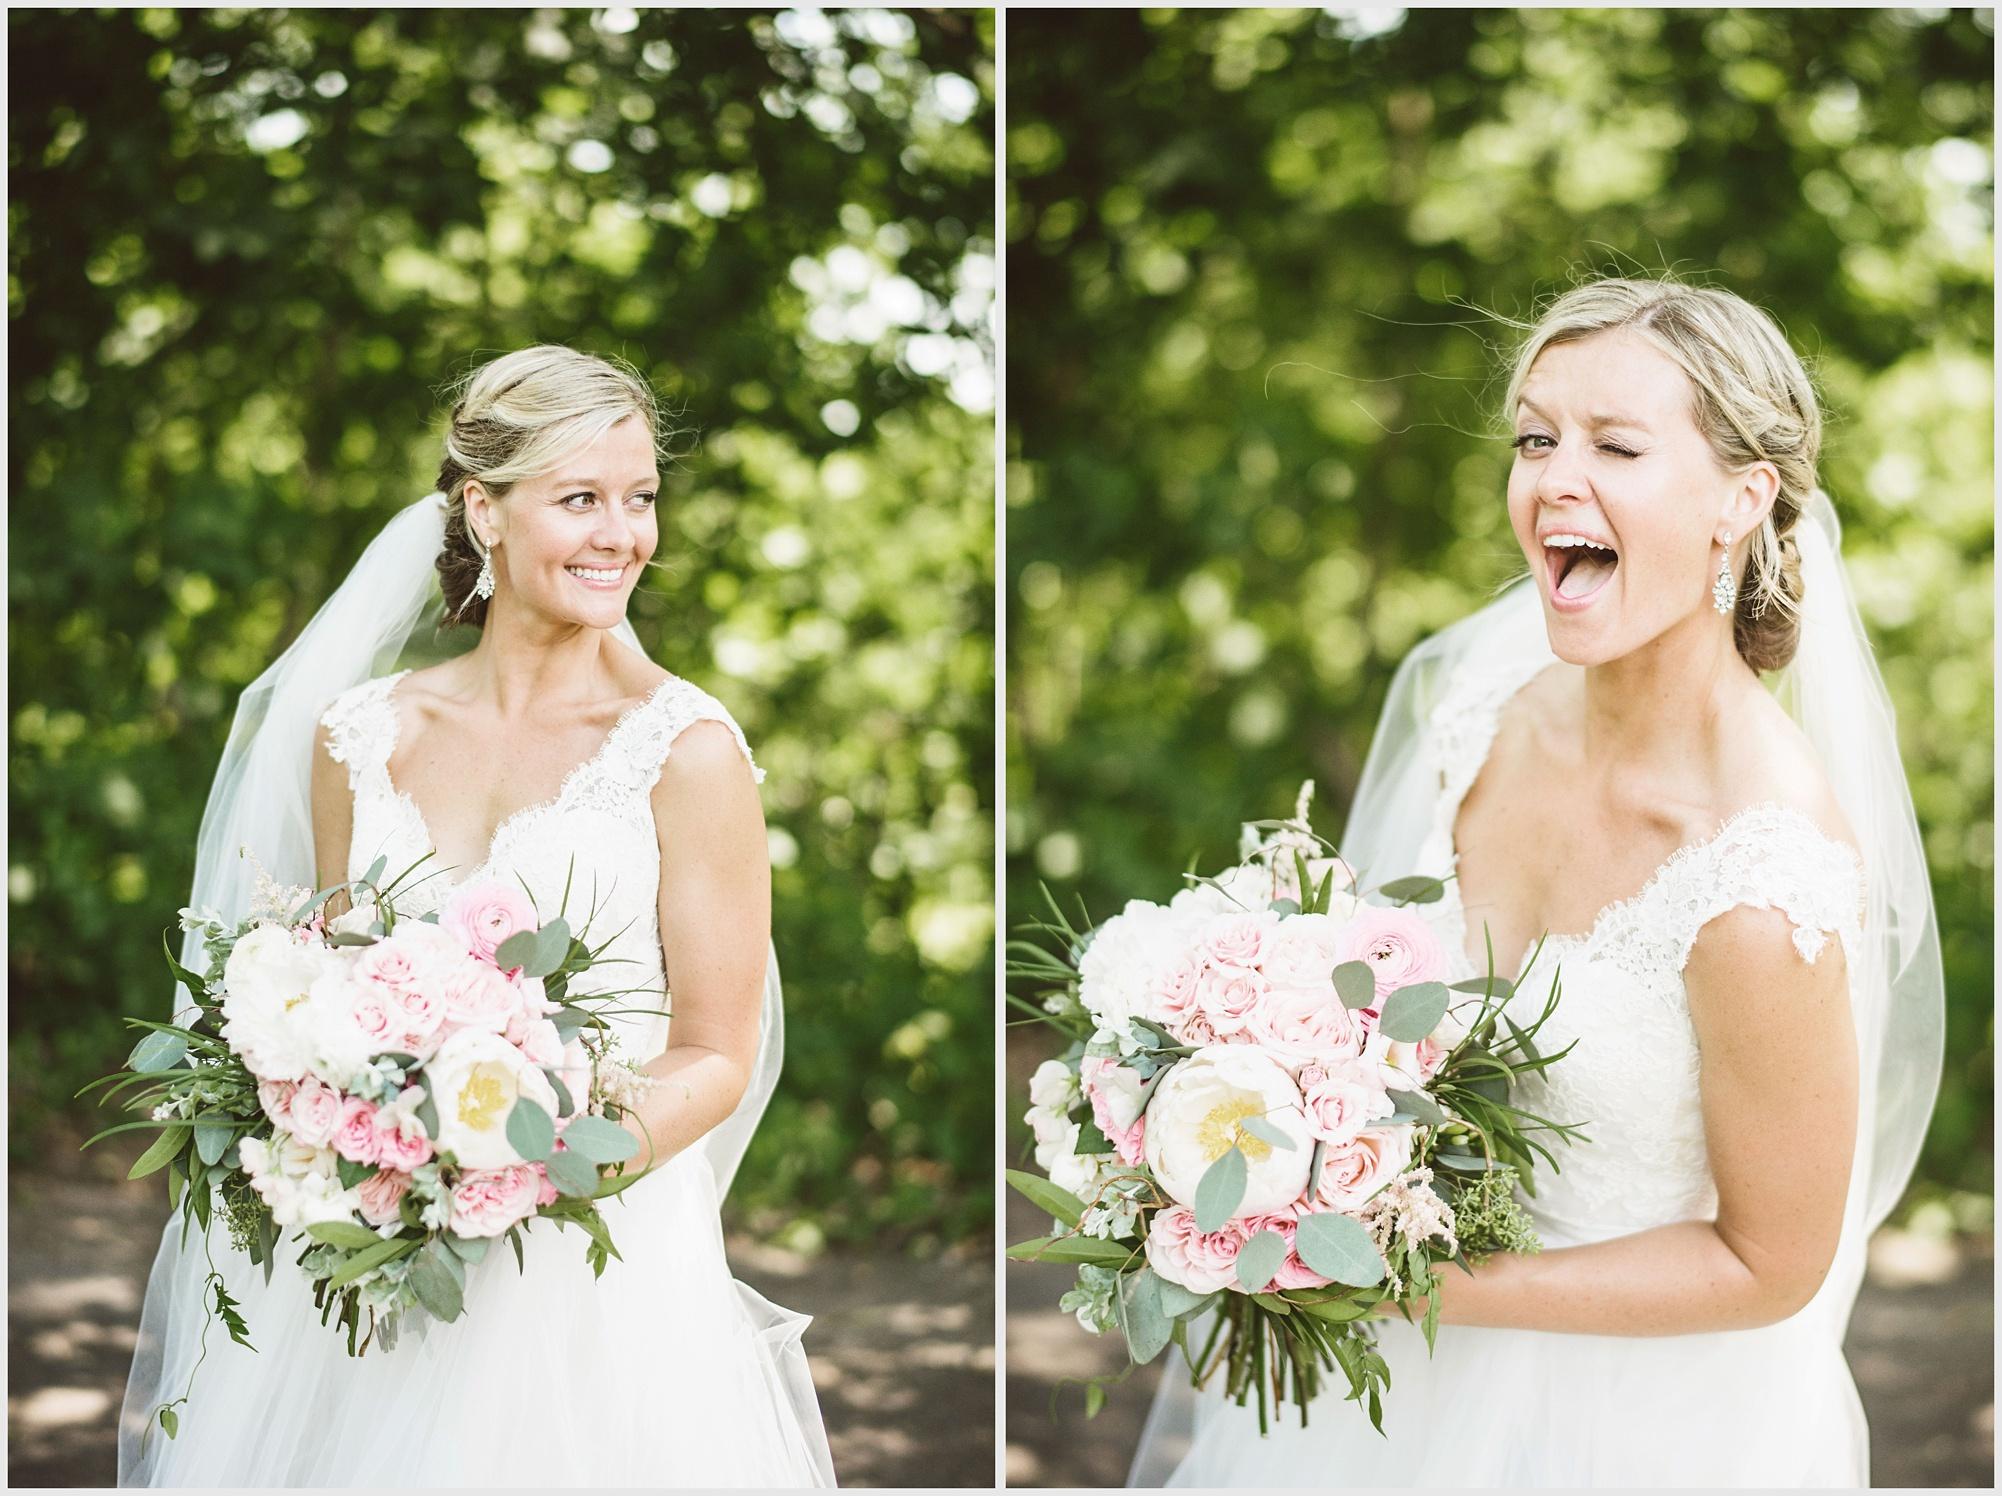 maura_david_james_j_hill_wedding_lucas_botz_photography_025.jpg